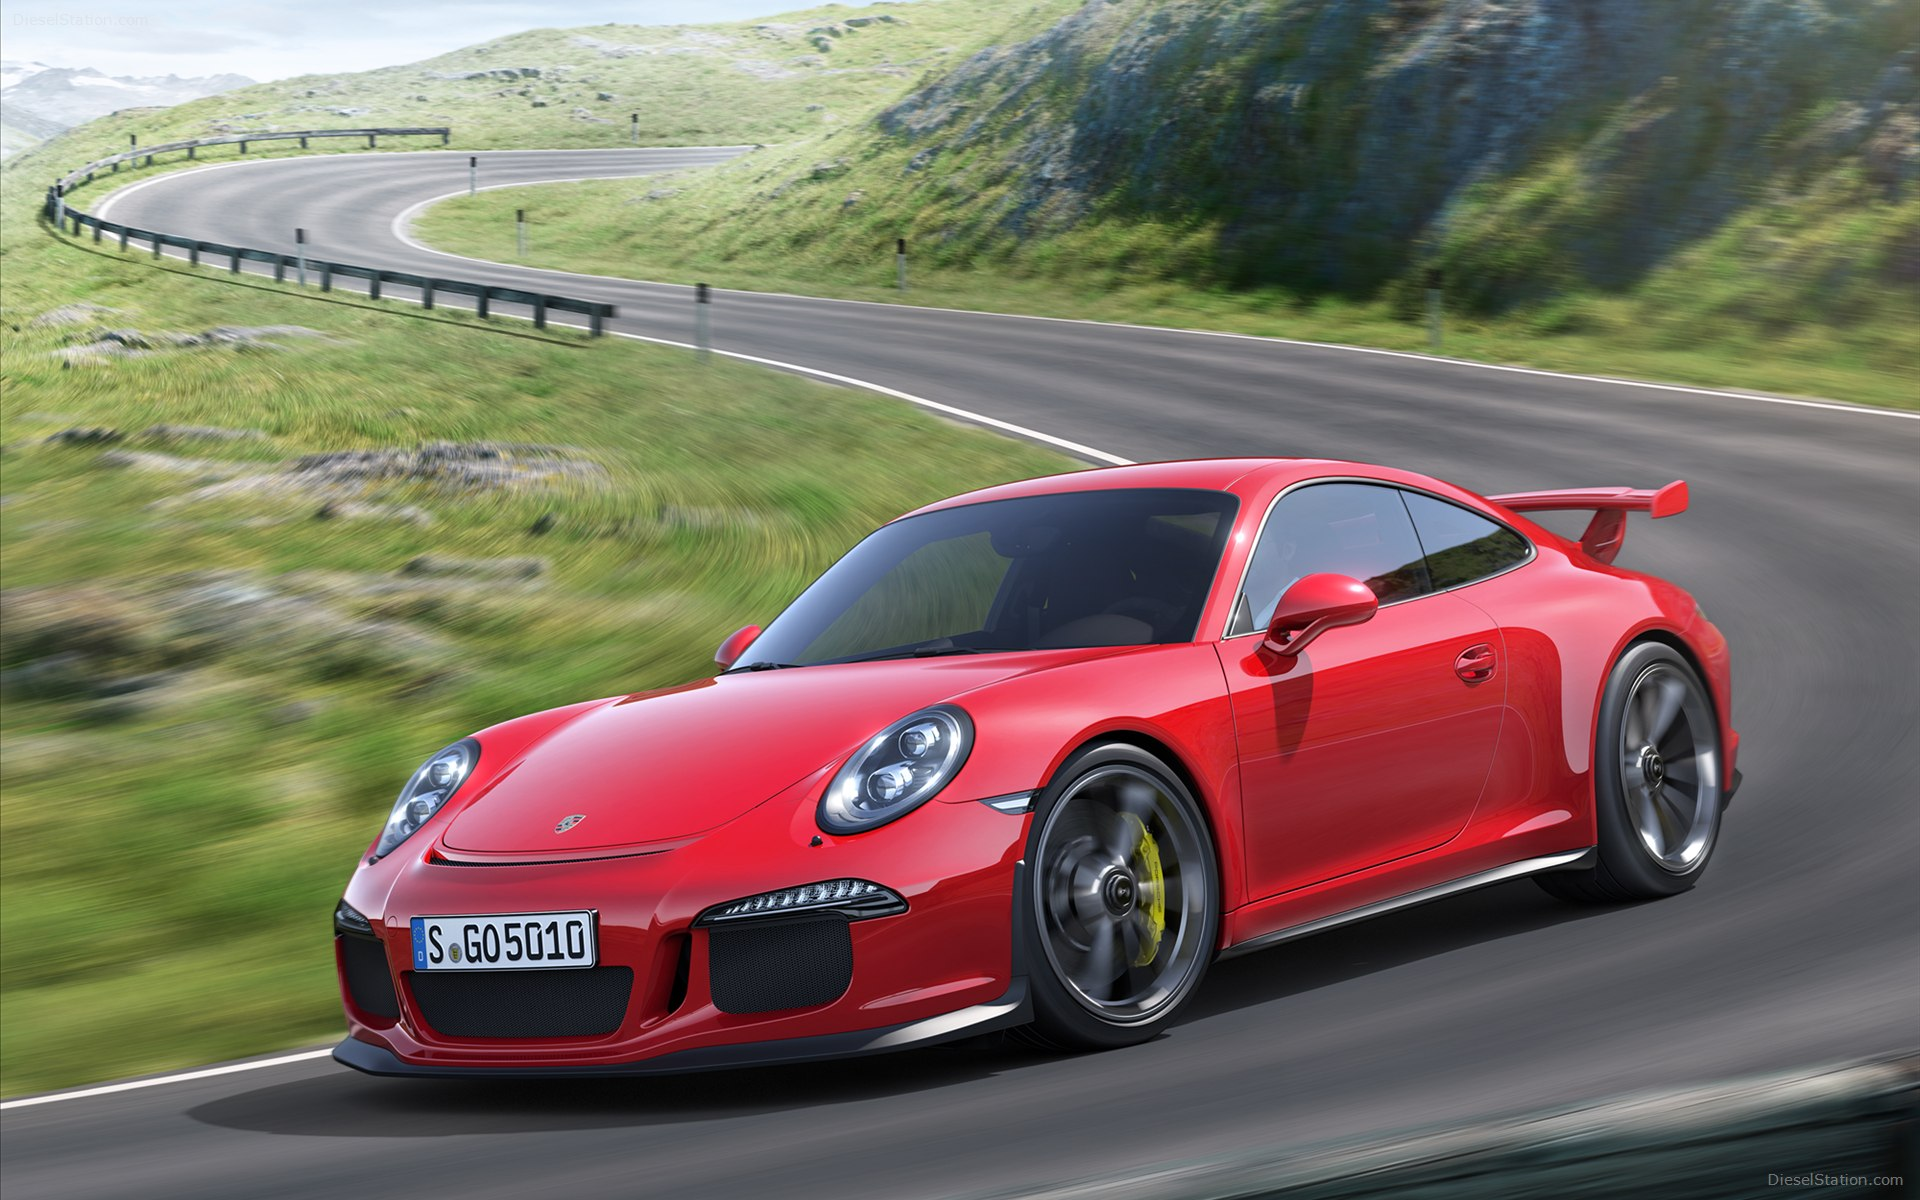 home porsche porsche 911 gt3 2014 - Porsche 911 Turbo 2014 Wallpaper